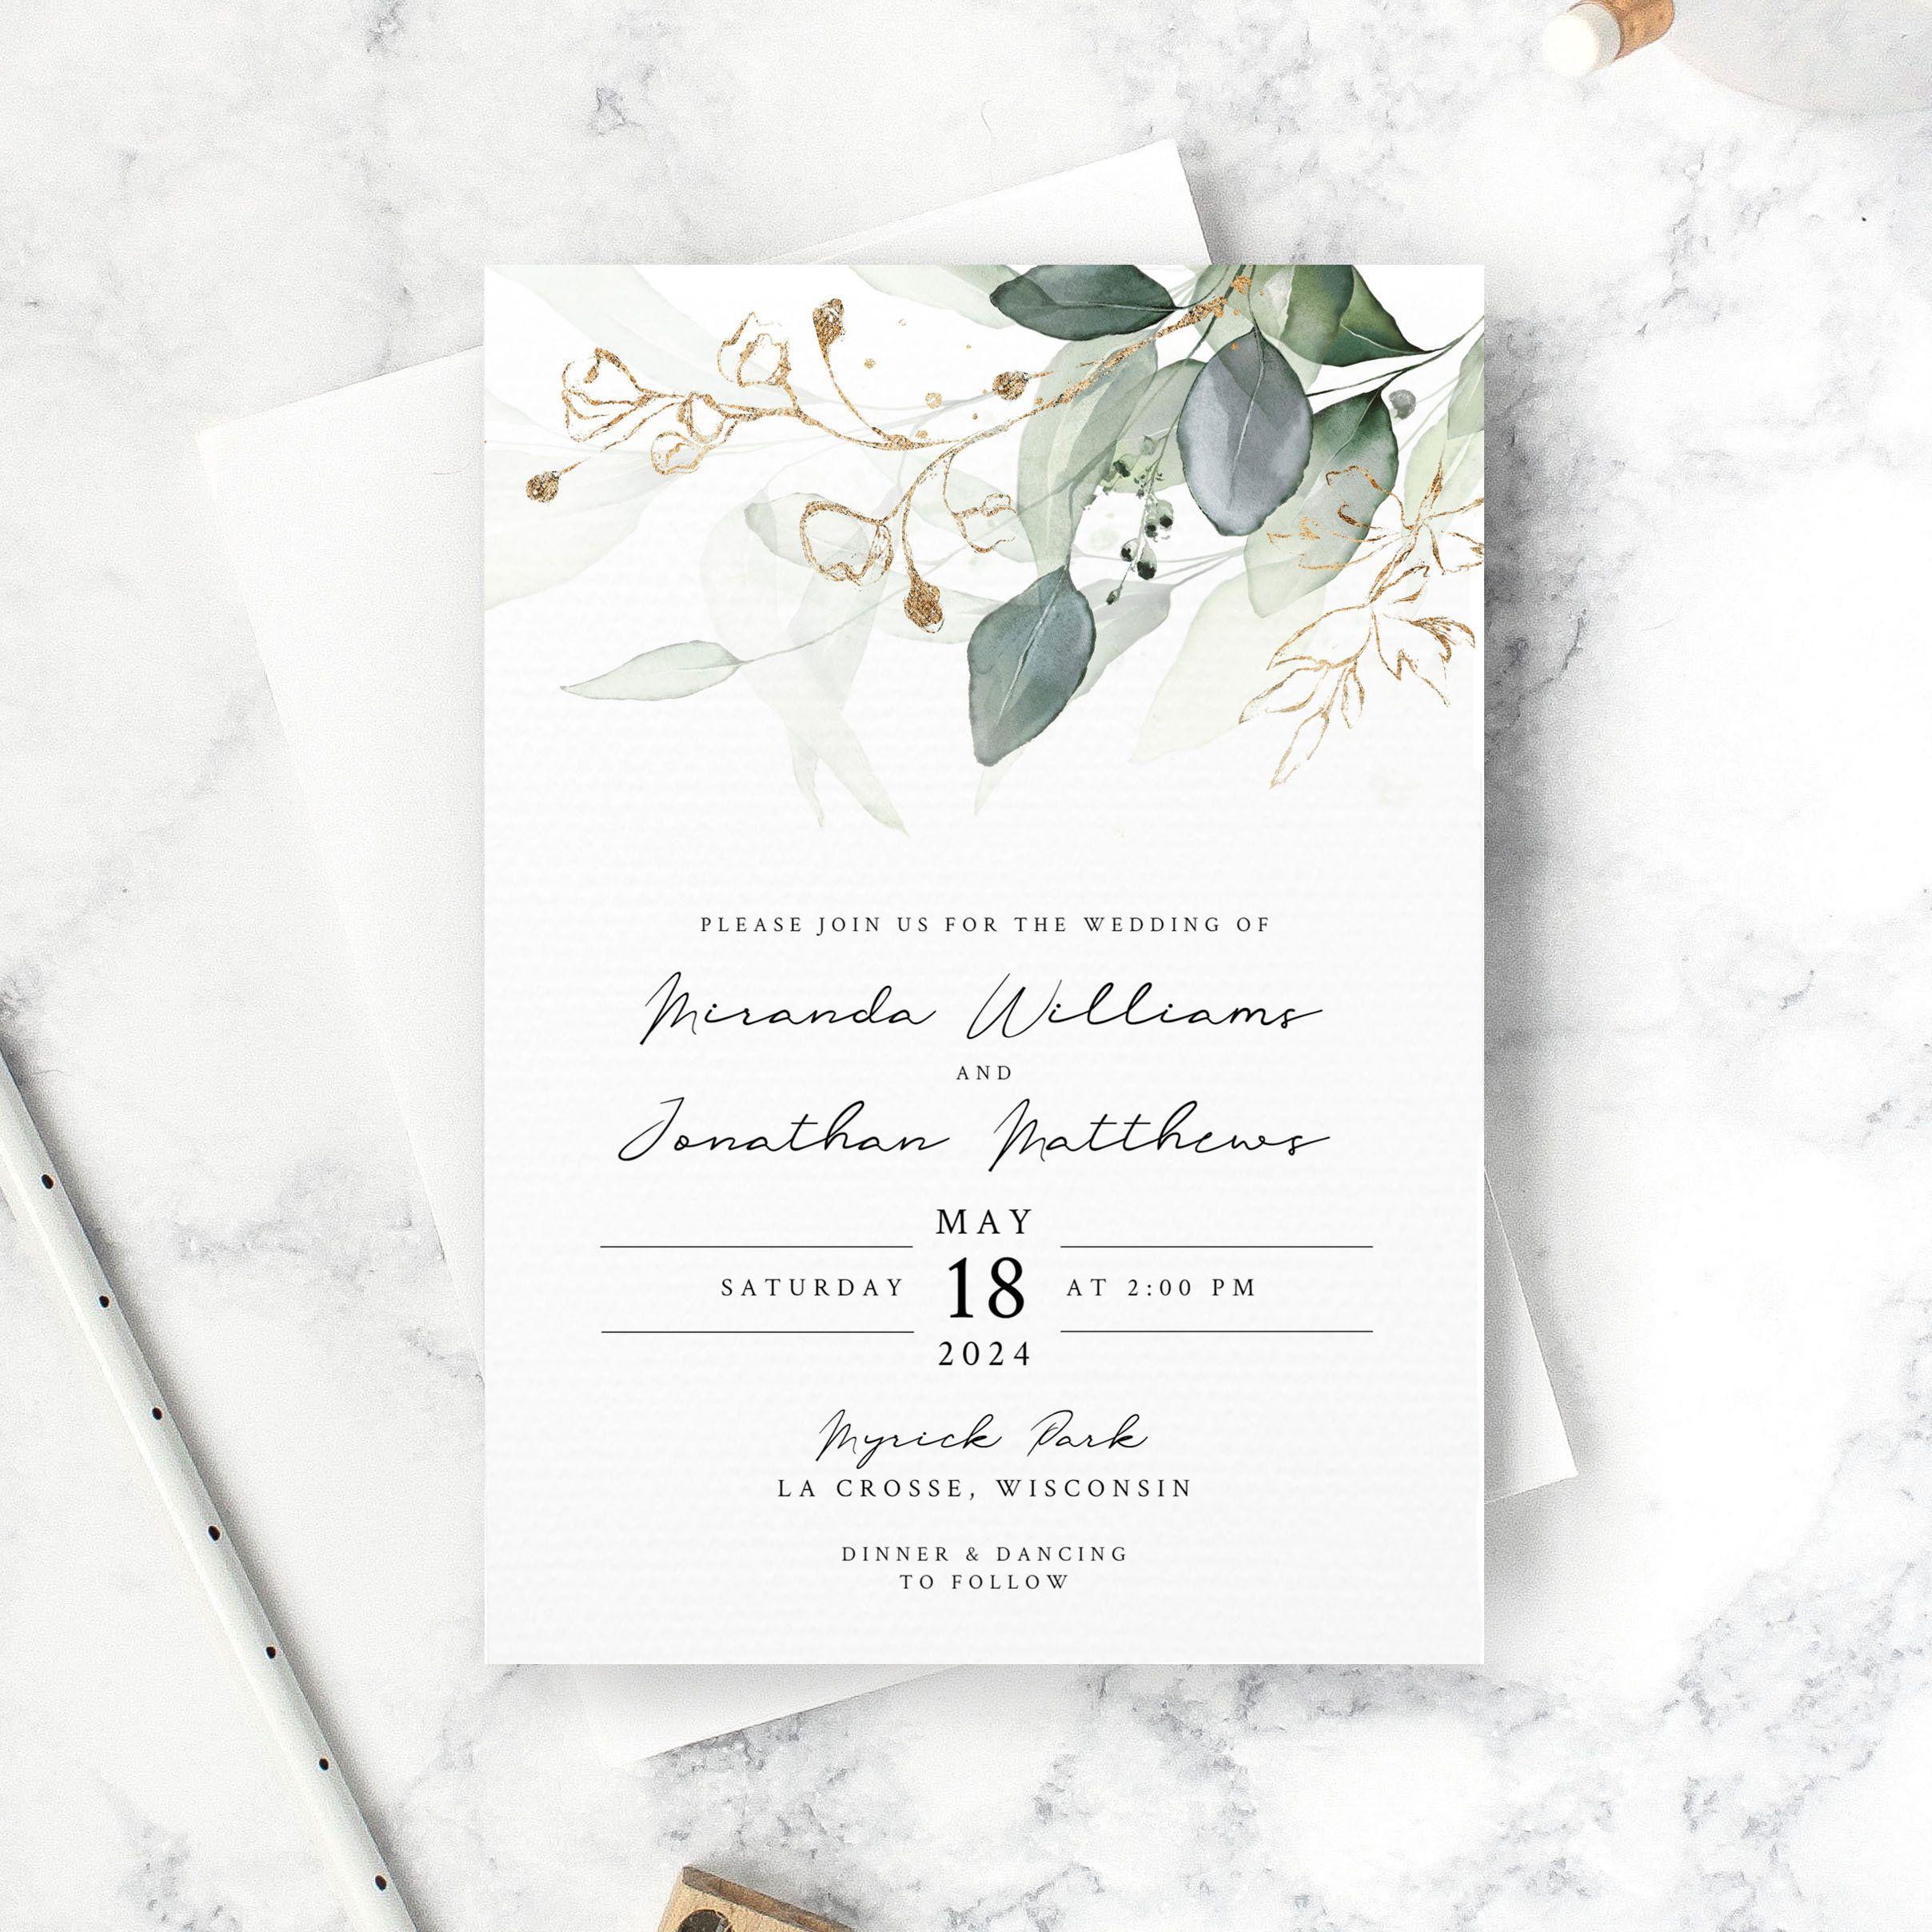 Eucalyptus Wedding Invitation Set Template Invitation Only Etsy In 2020 Eucalyptus Wedding Invitation Wedding Invitation Sets Wedding Invitations